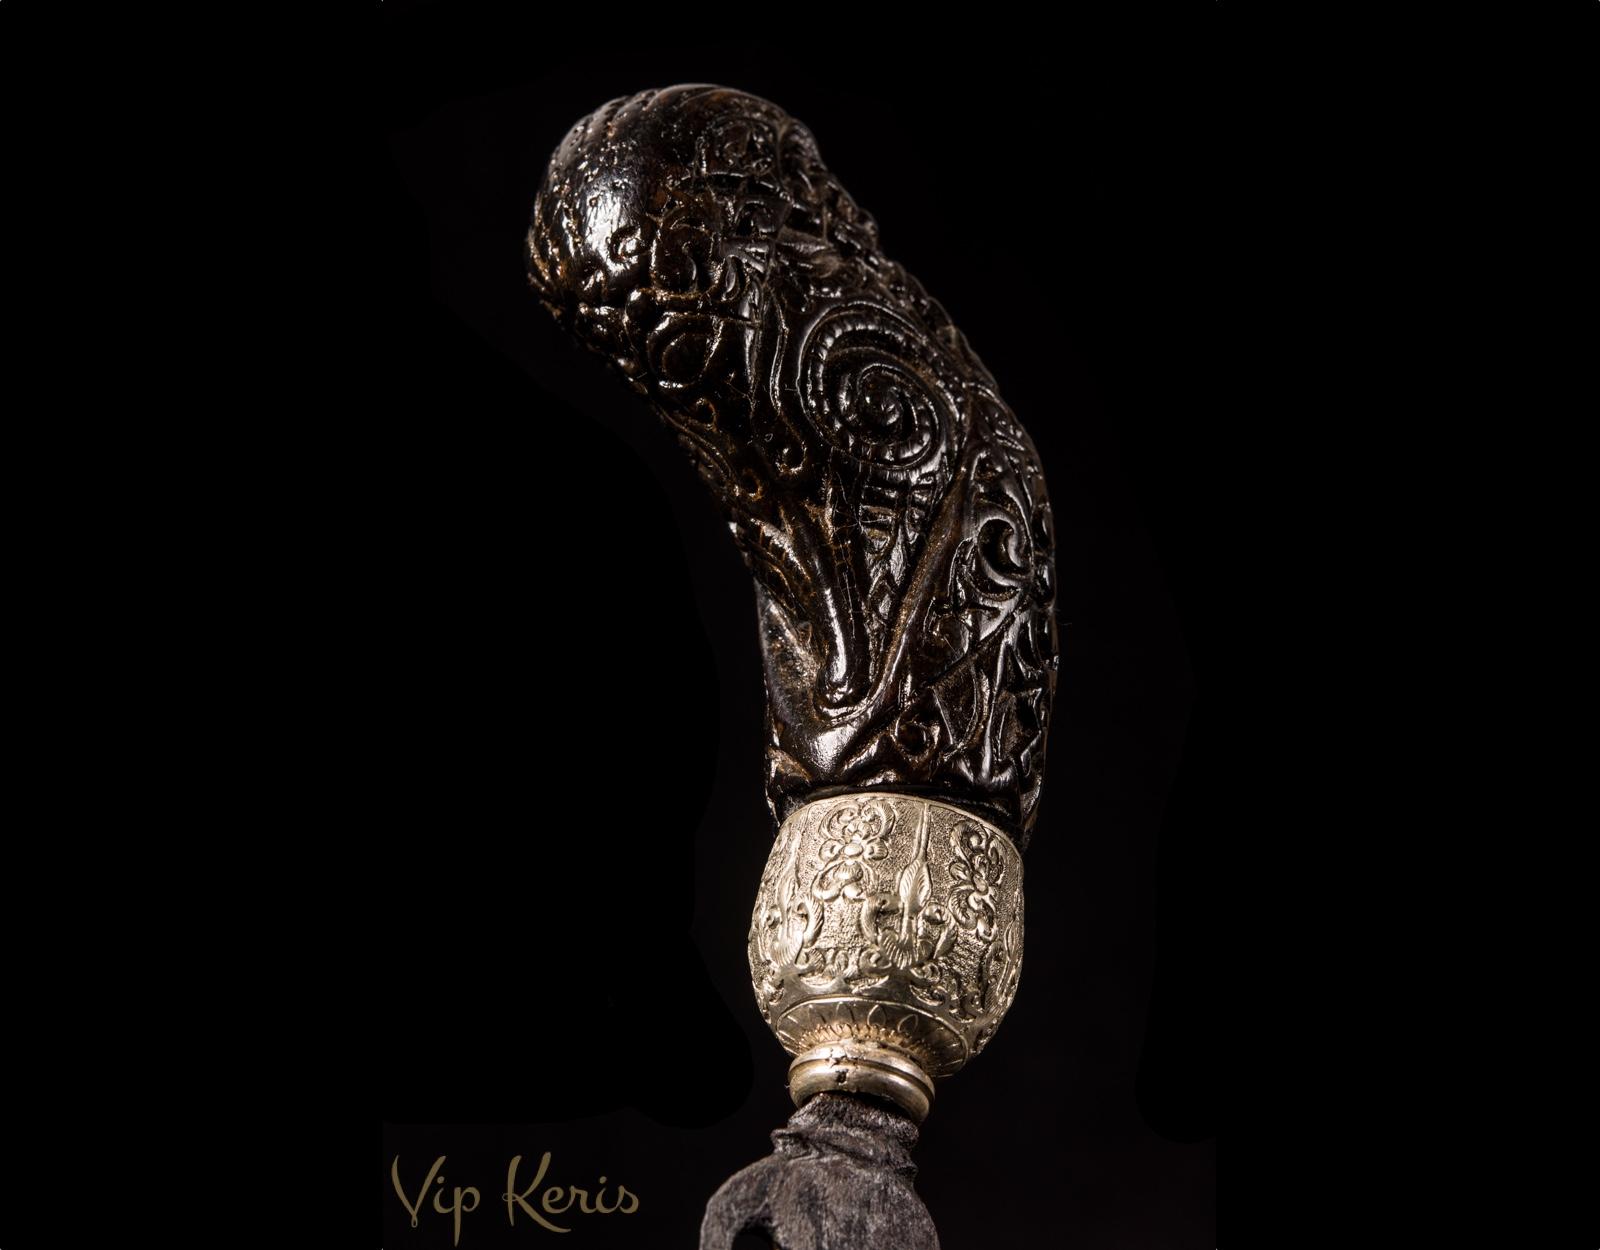 Артефакт из священного металла Kudi Ciung фото VipKeris